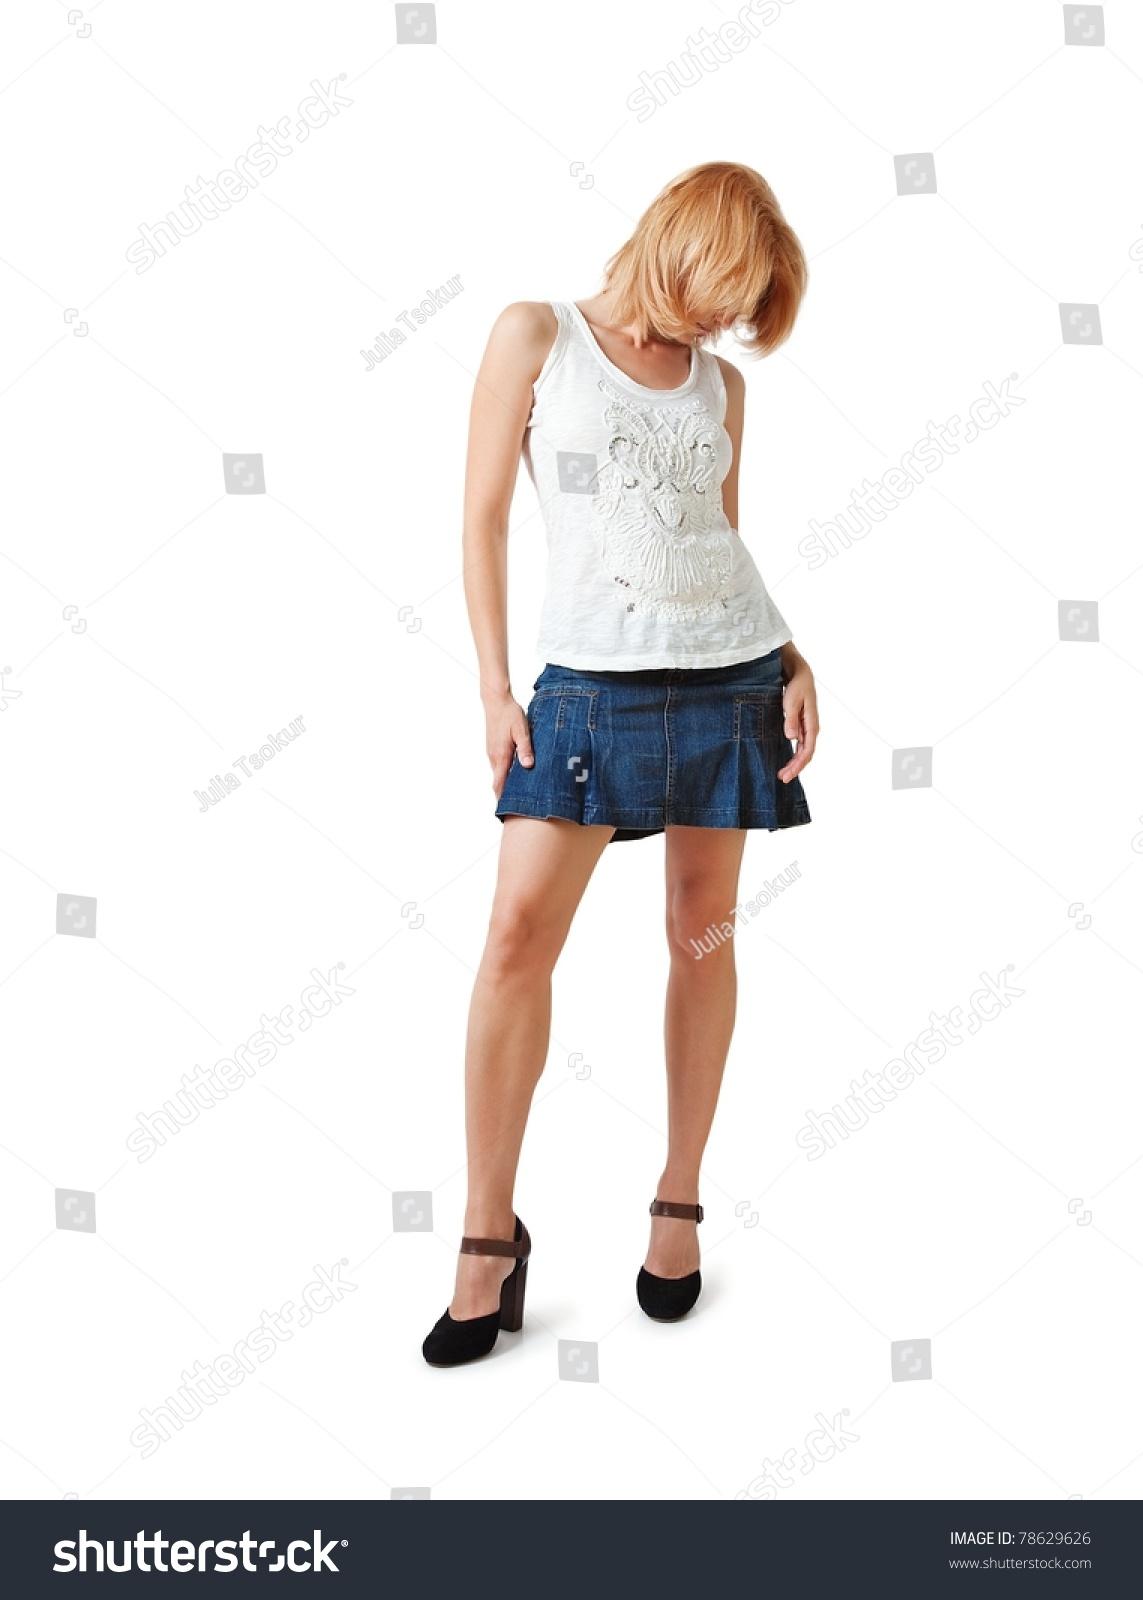 Women in short skirts high heels